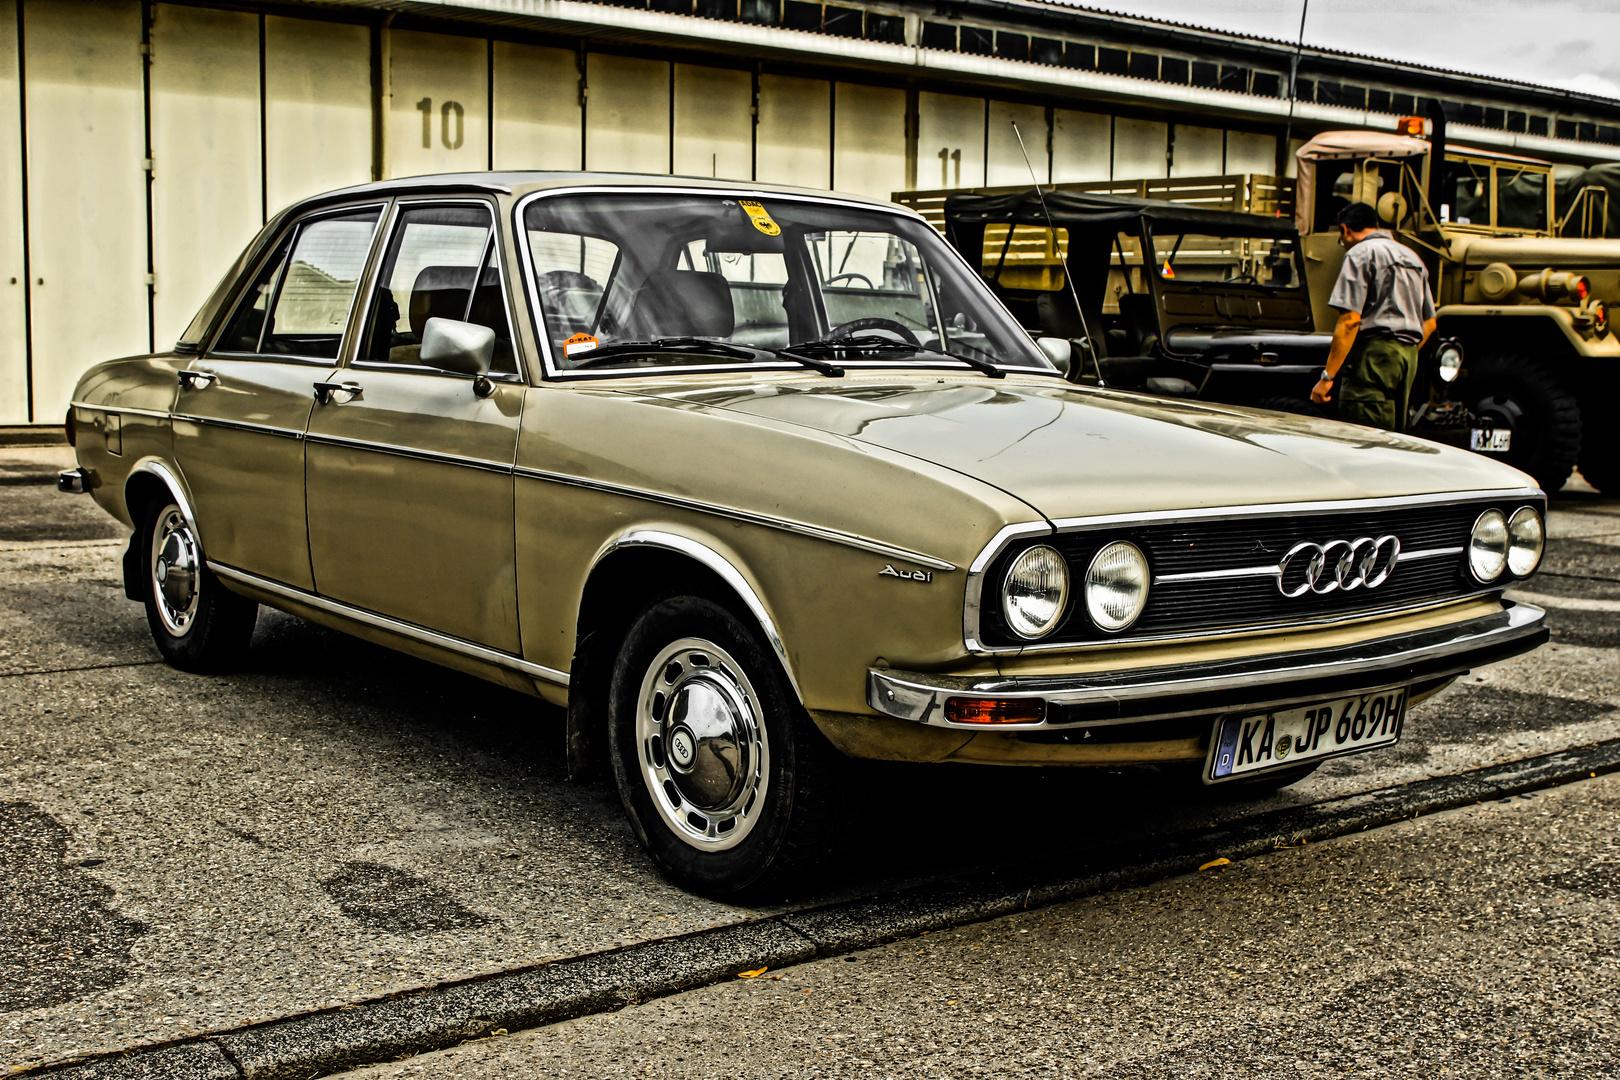 Audi - HDR